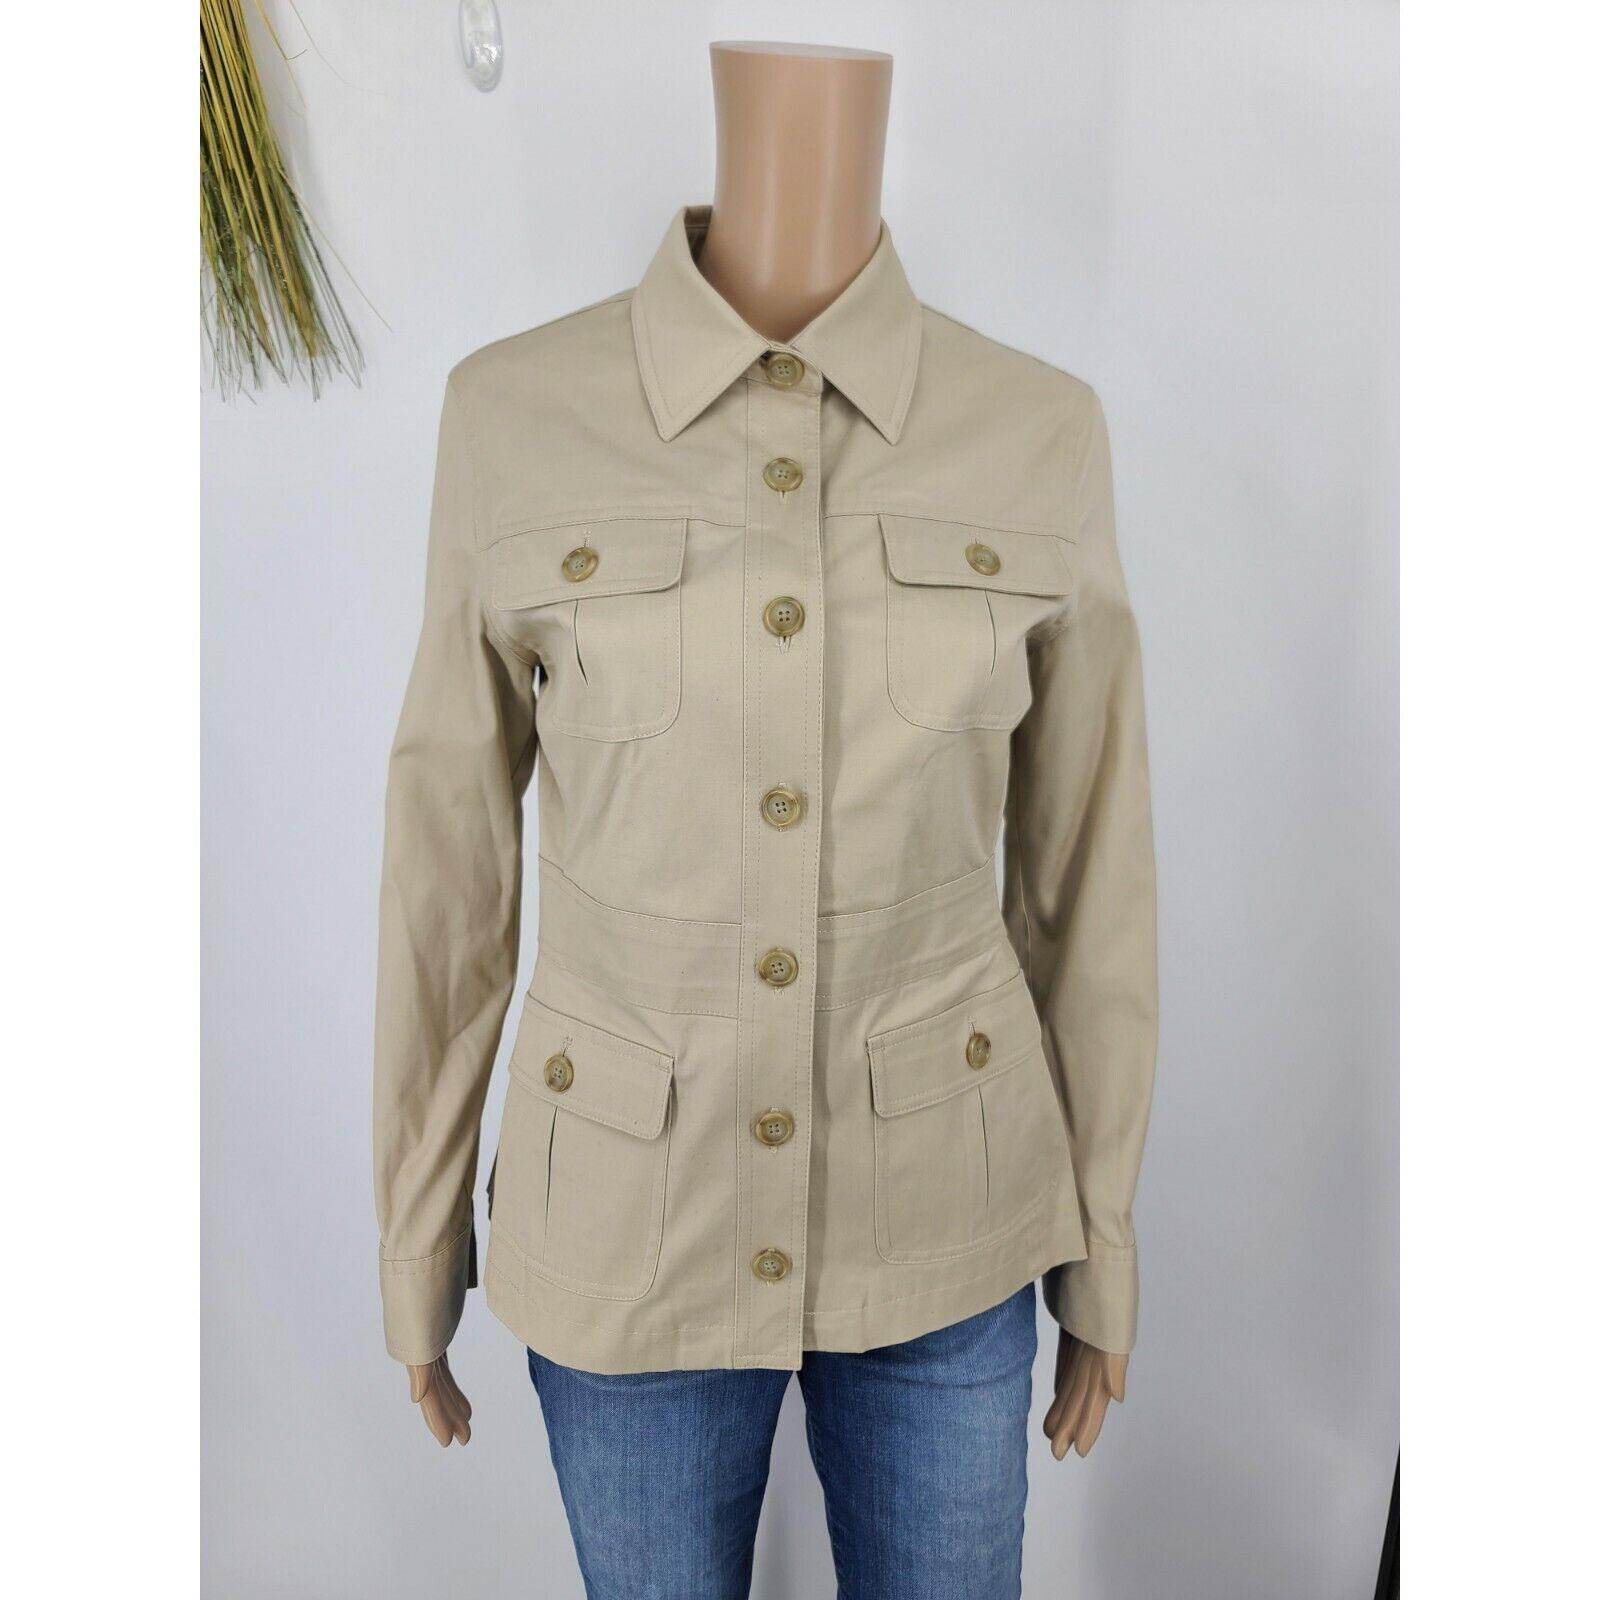 Brooks Brothers Jacket Size 2 Khaki Utility Button Up Stretch Cotton Lined Women